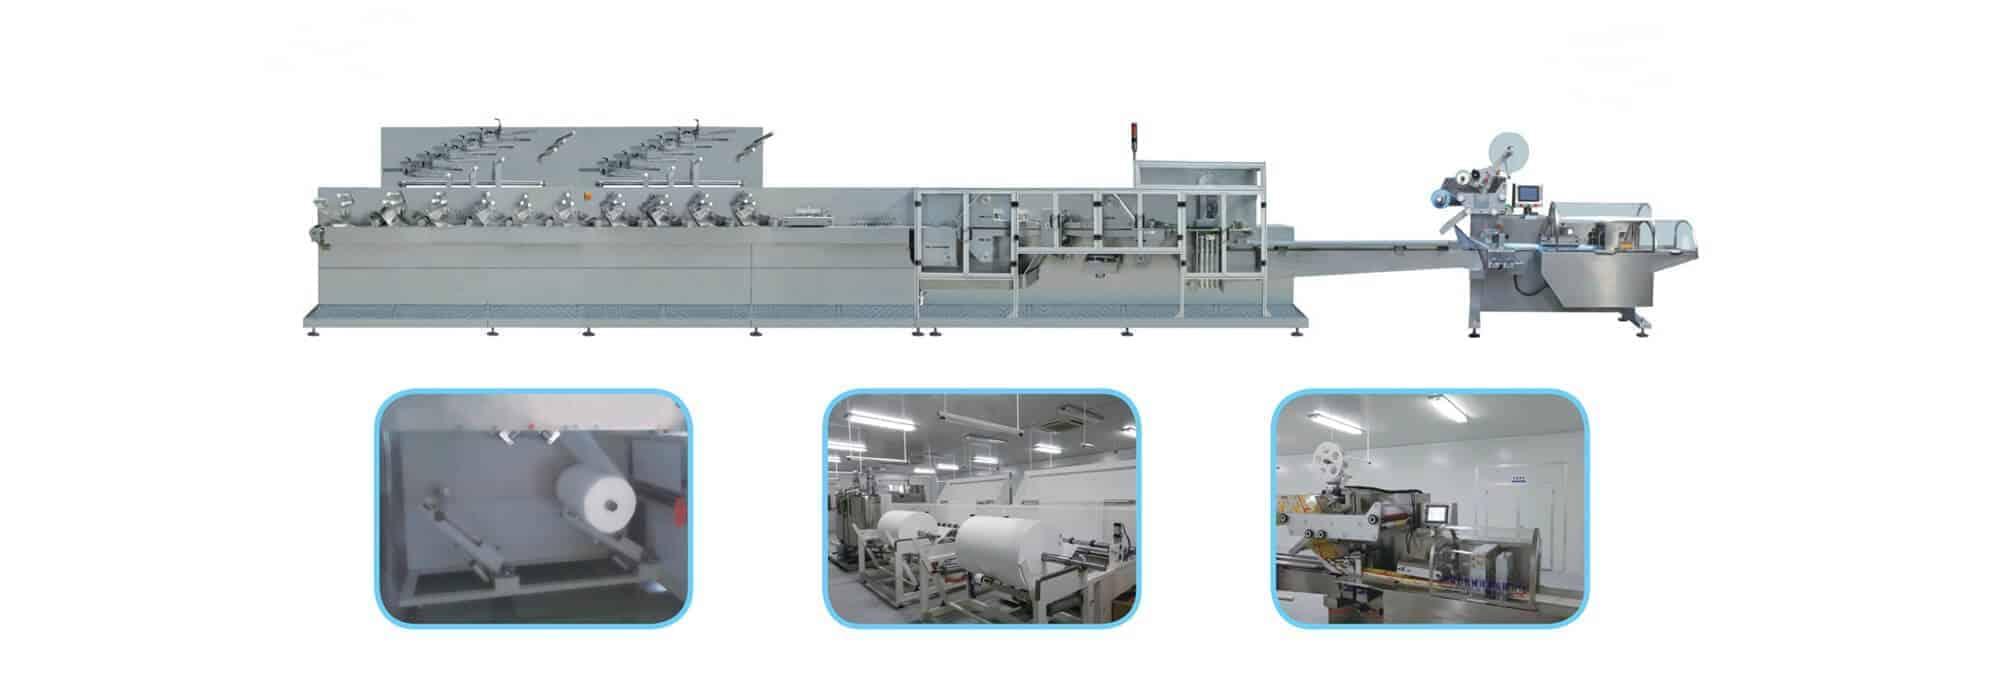 UT BL1012 - UT-BL 10(12 ) Automatic baby wipes production line (30-120pcs/pack)